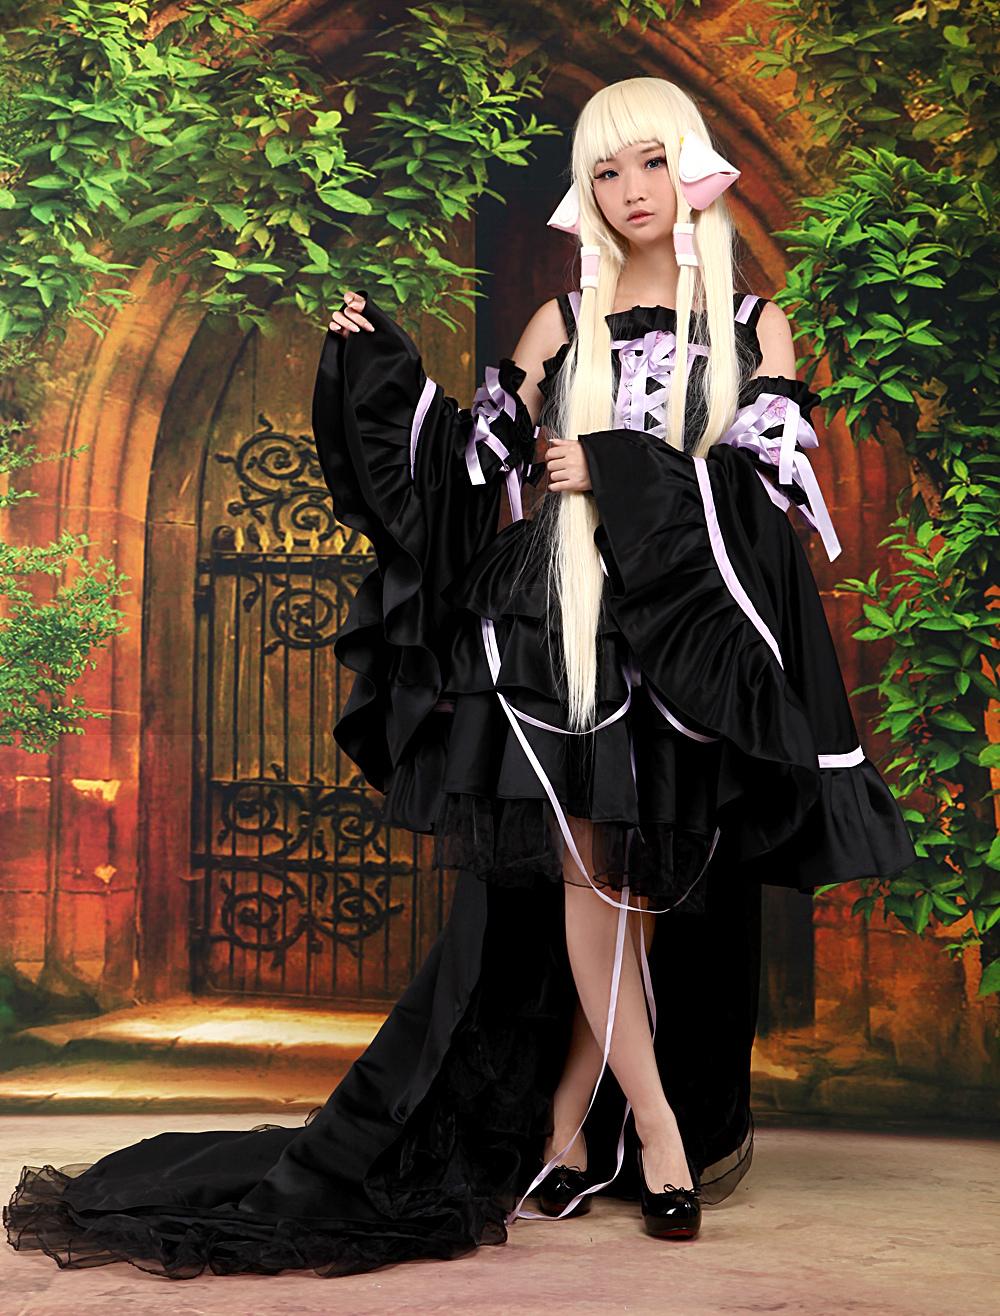 Chobits Chii Halloween Cosplay Costume Black Cute Lolita Dress Halloween